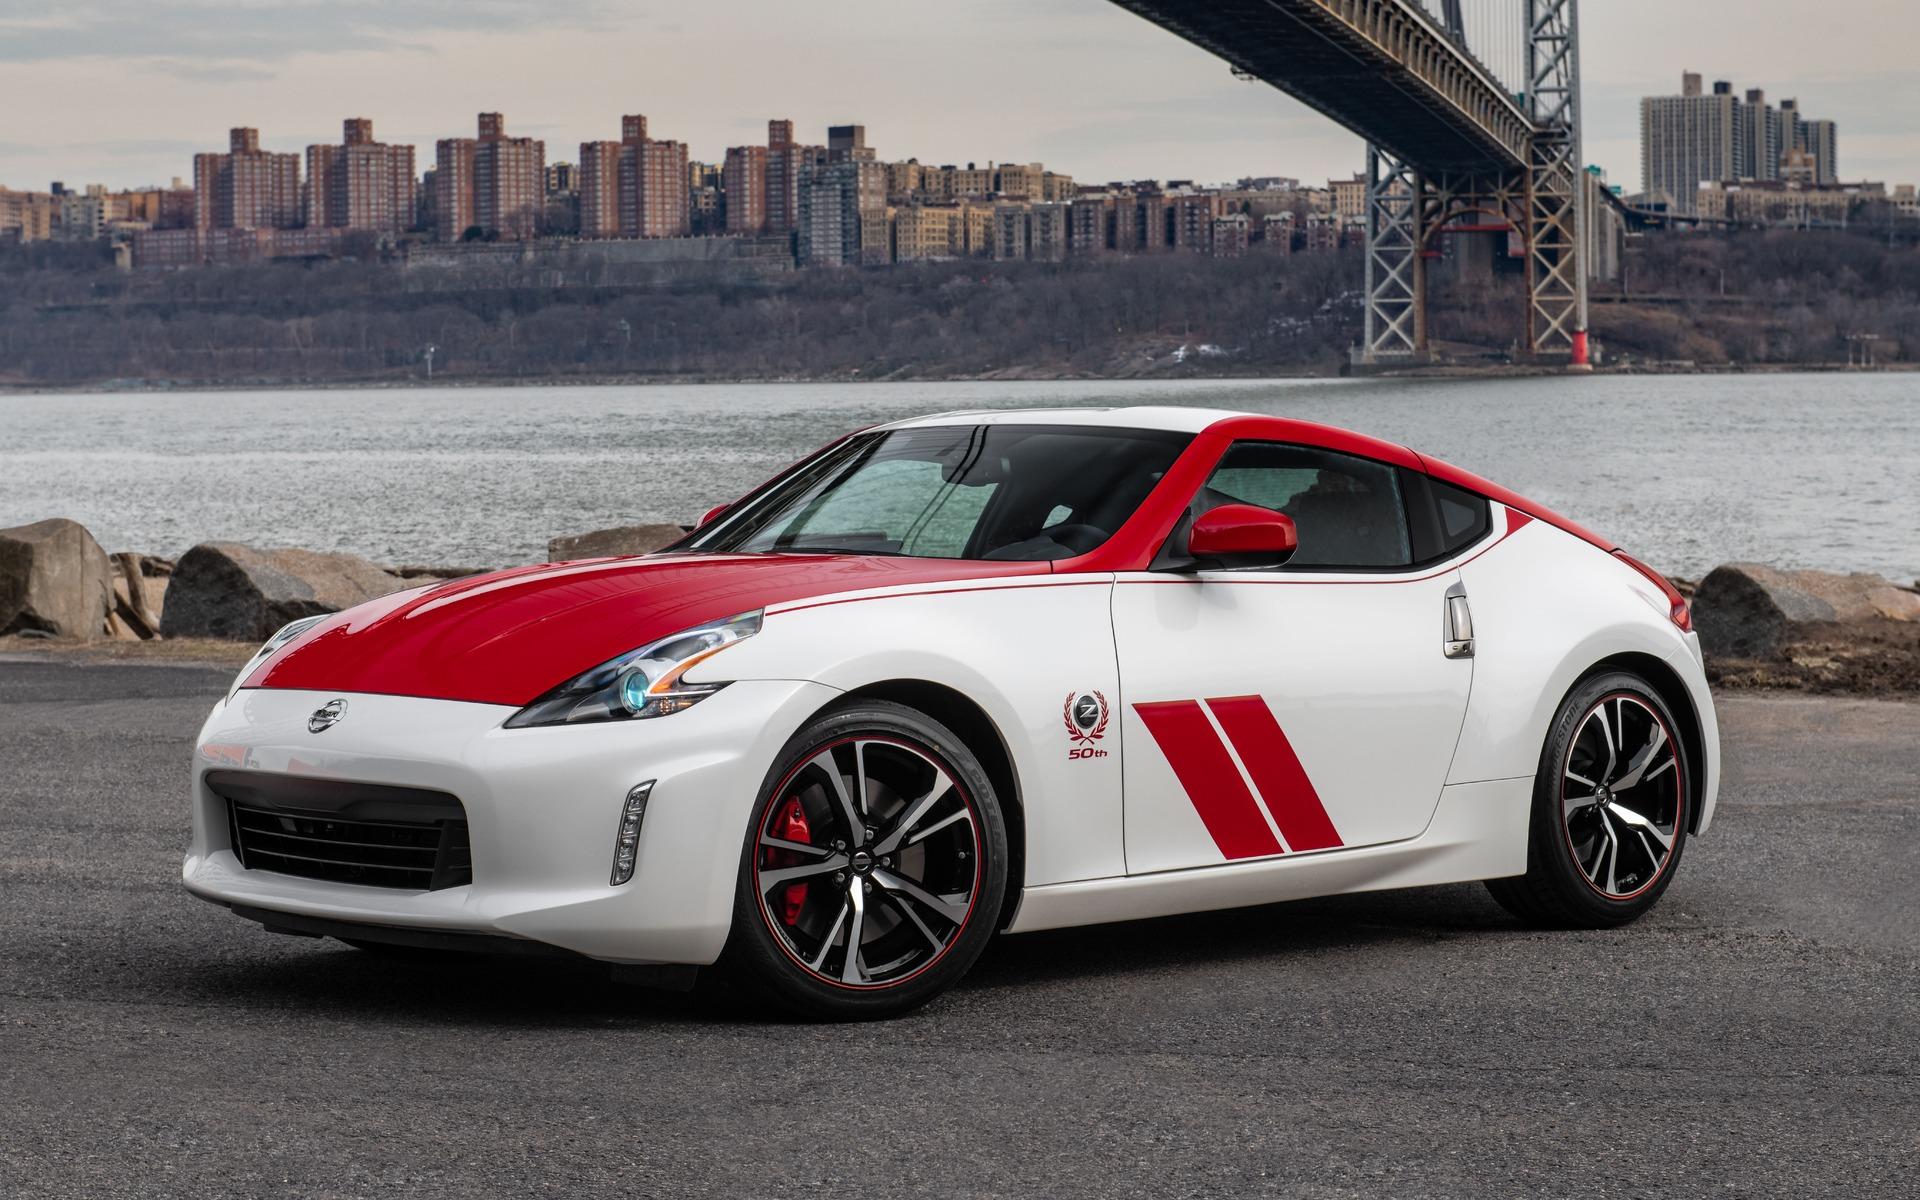 2020 Nissan Z Car First Drive